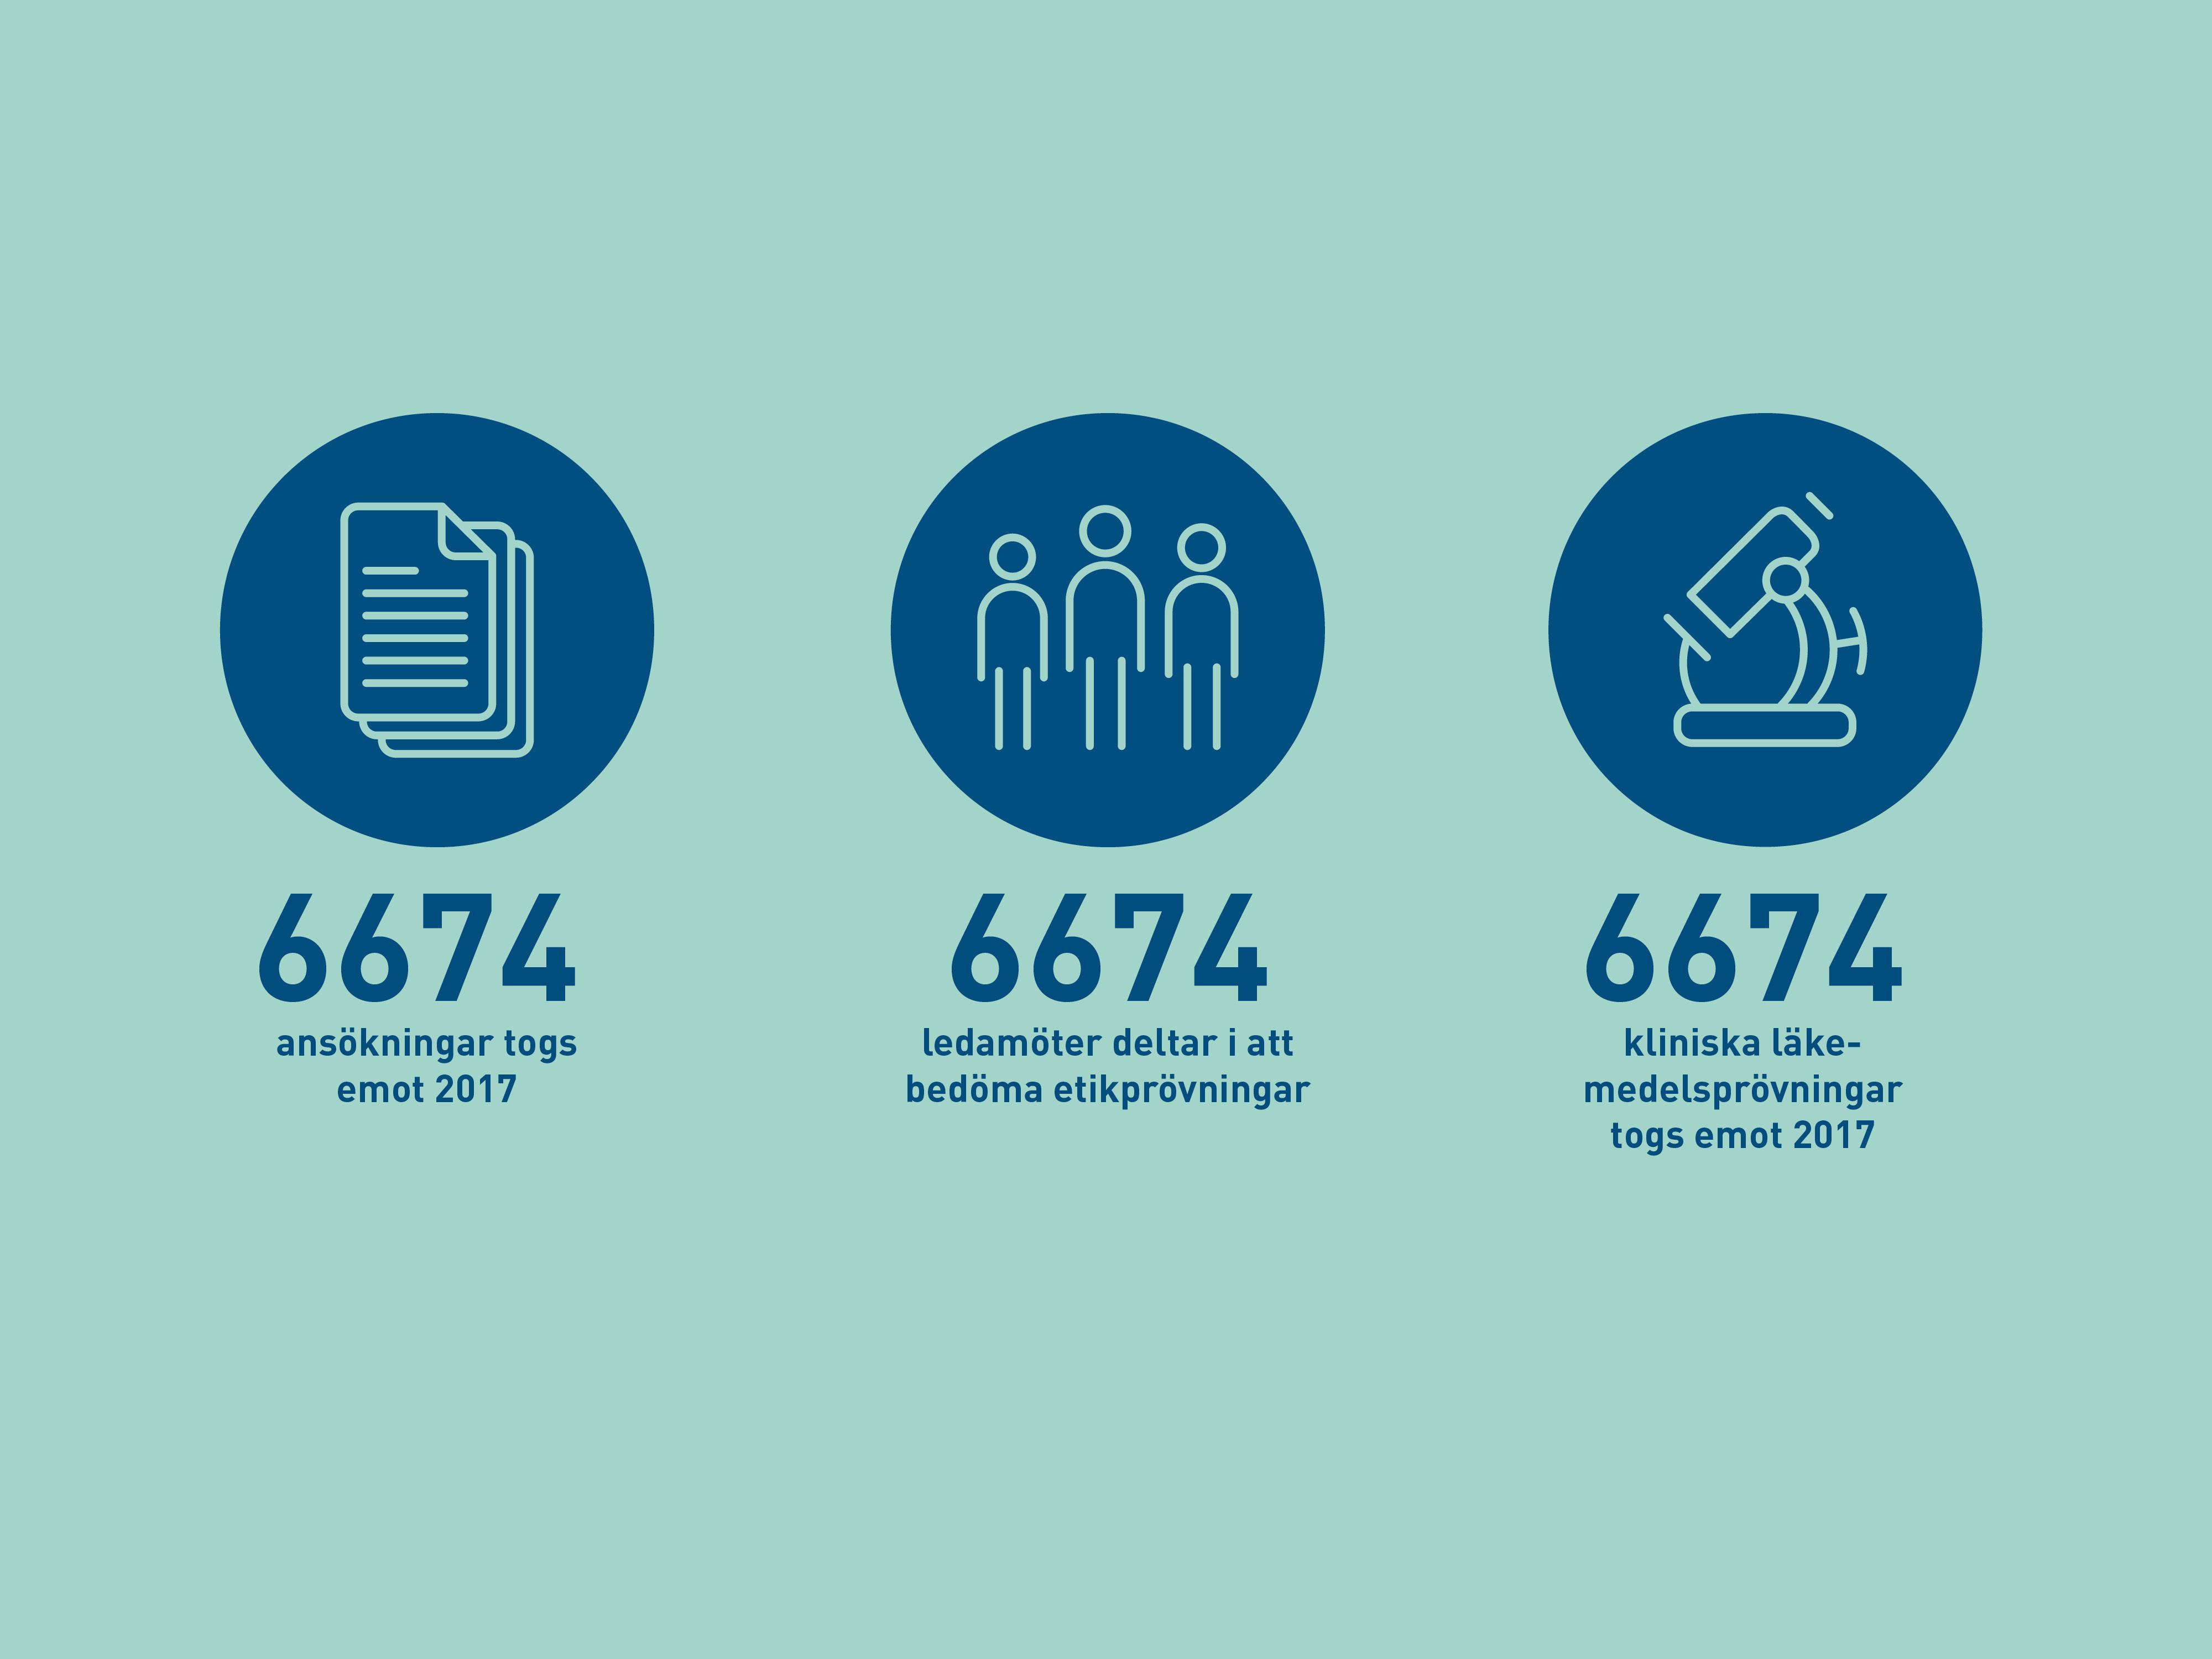 Etikprövningsmyndigheten fakta